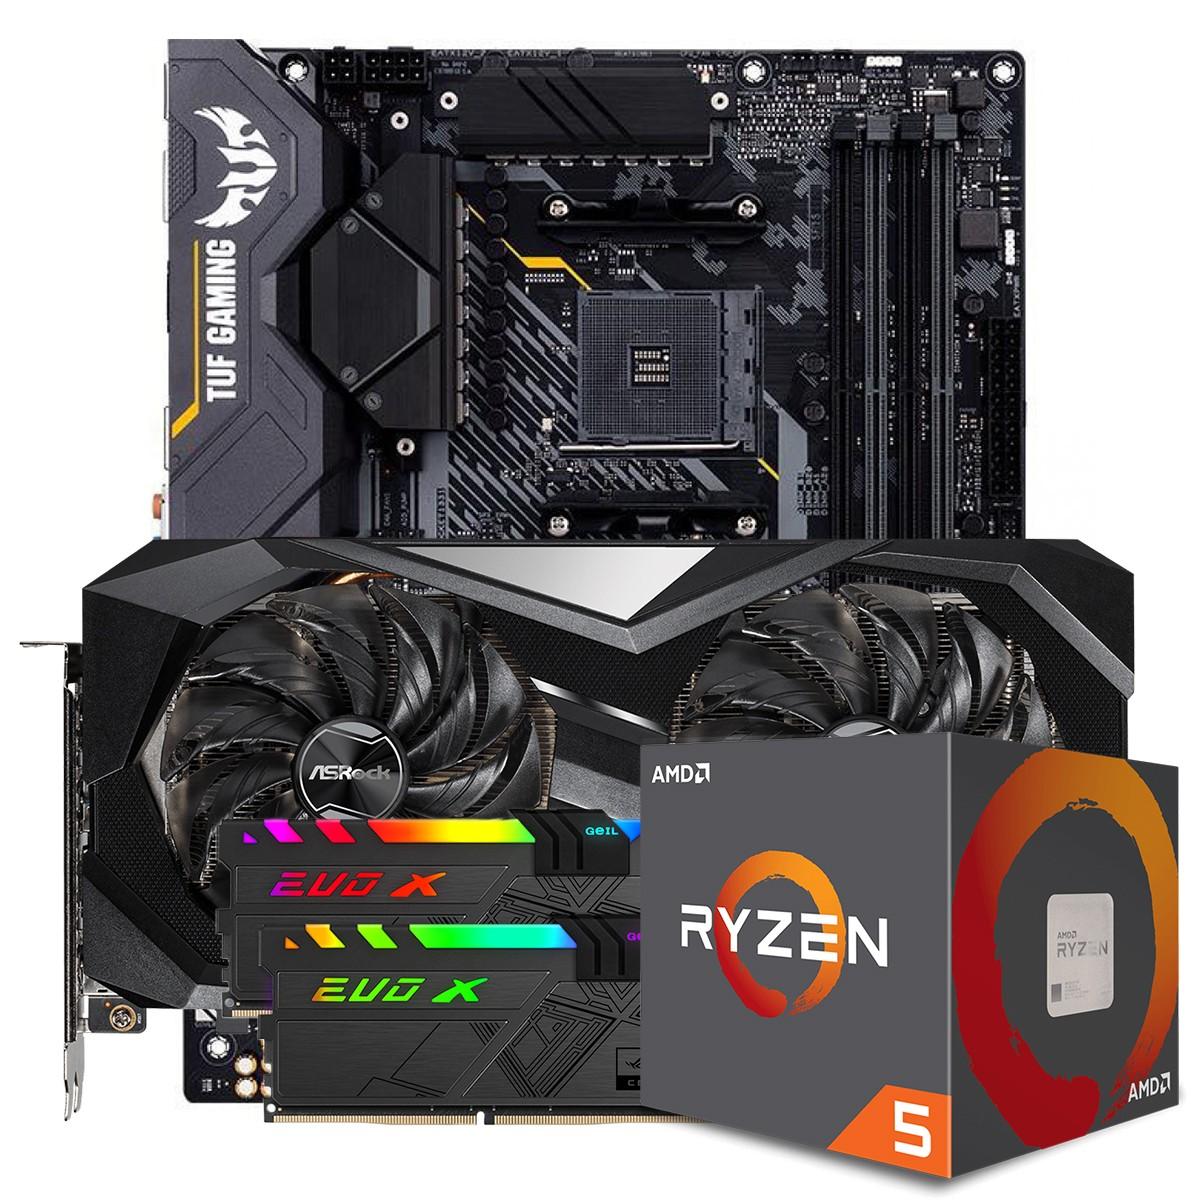 Kit Upgrade ASRock Radeon RX 6700 XT Challenger + AMD Ryzen 5 5600X + ASUS TUF Gaming X570-Plus + Memória DDR4 16GB (2x8GB) 3600MHz